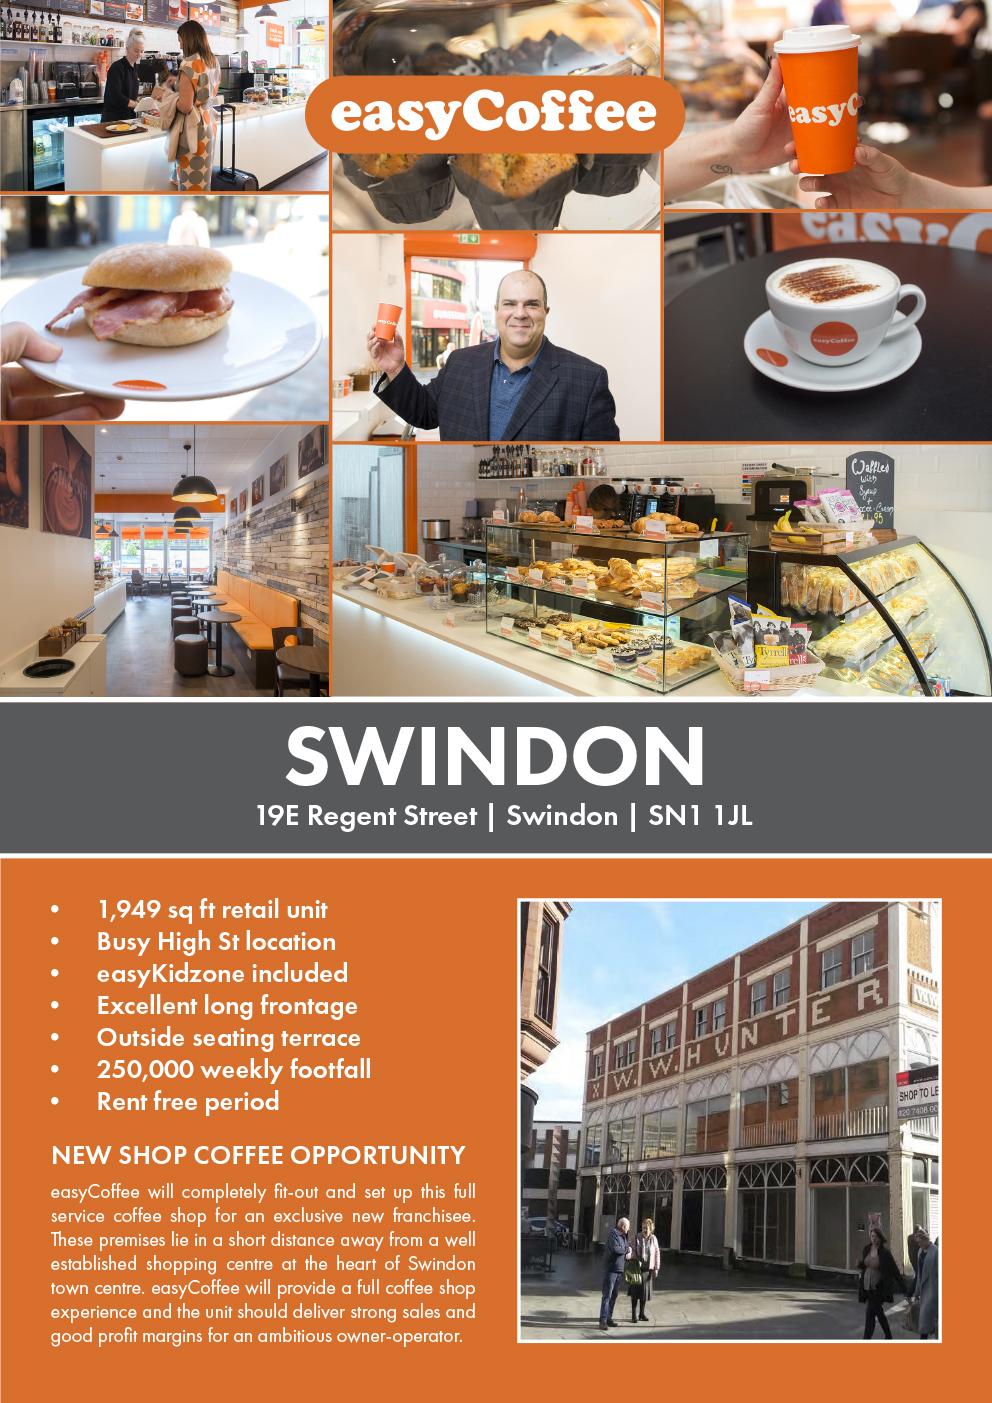 easyCoffee shop_Swindon_1.jpg